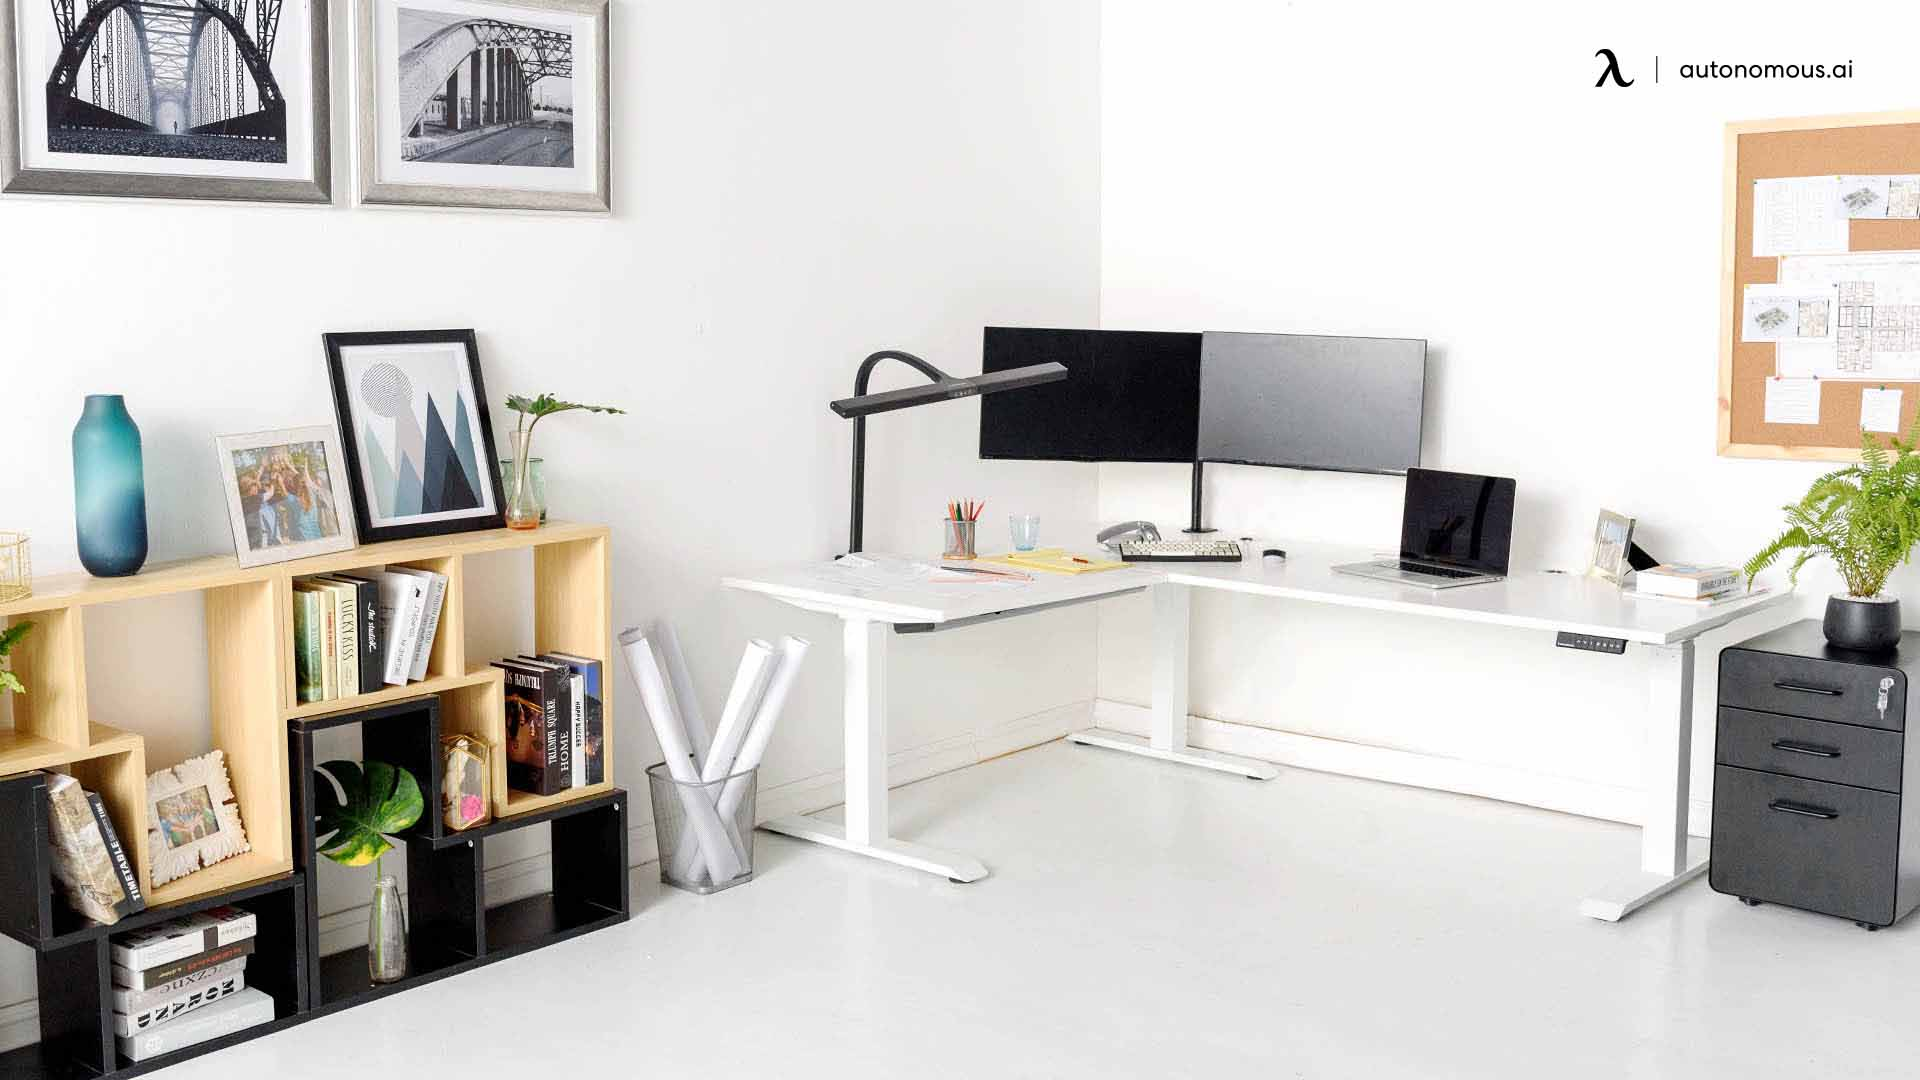 How to Make Your DIY L-Shaped Standing Desk Setup